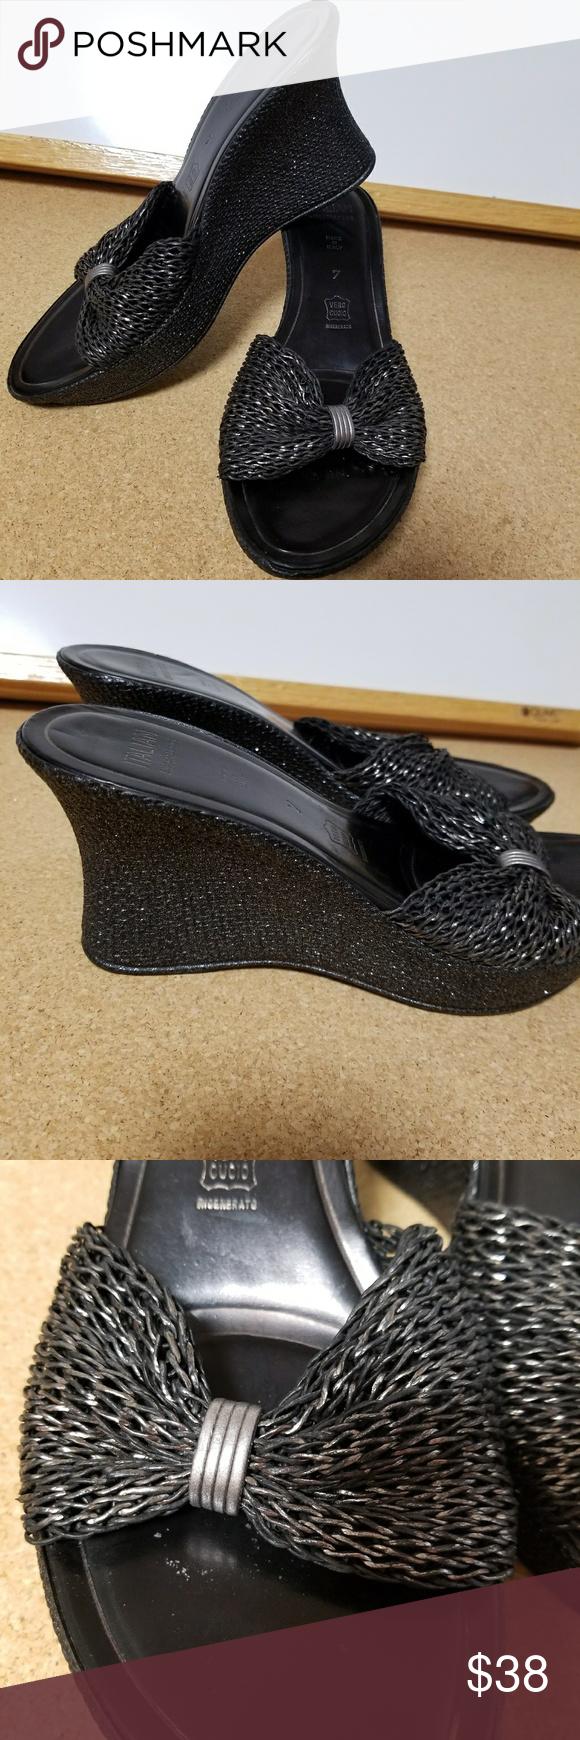 44a933dbe PRICE DROP!Vero Cuoio wedge sandals